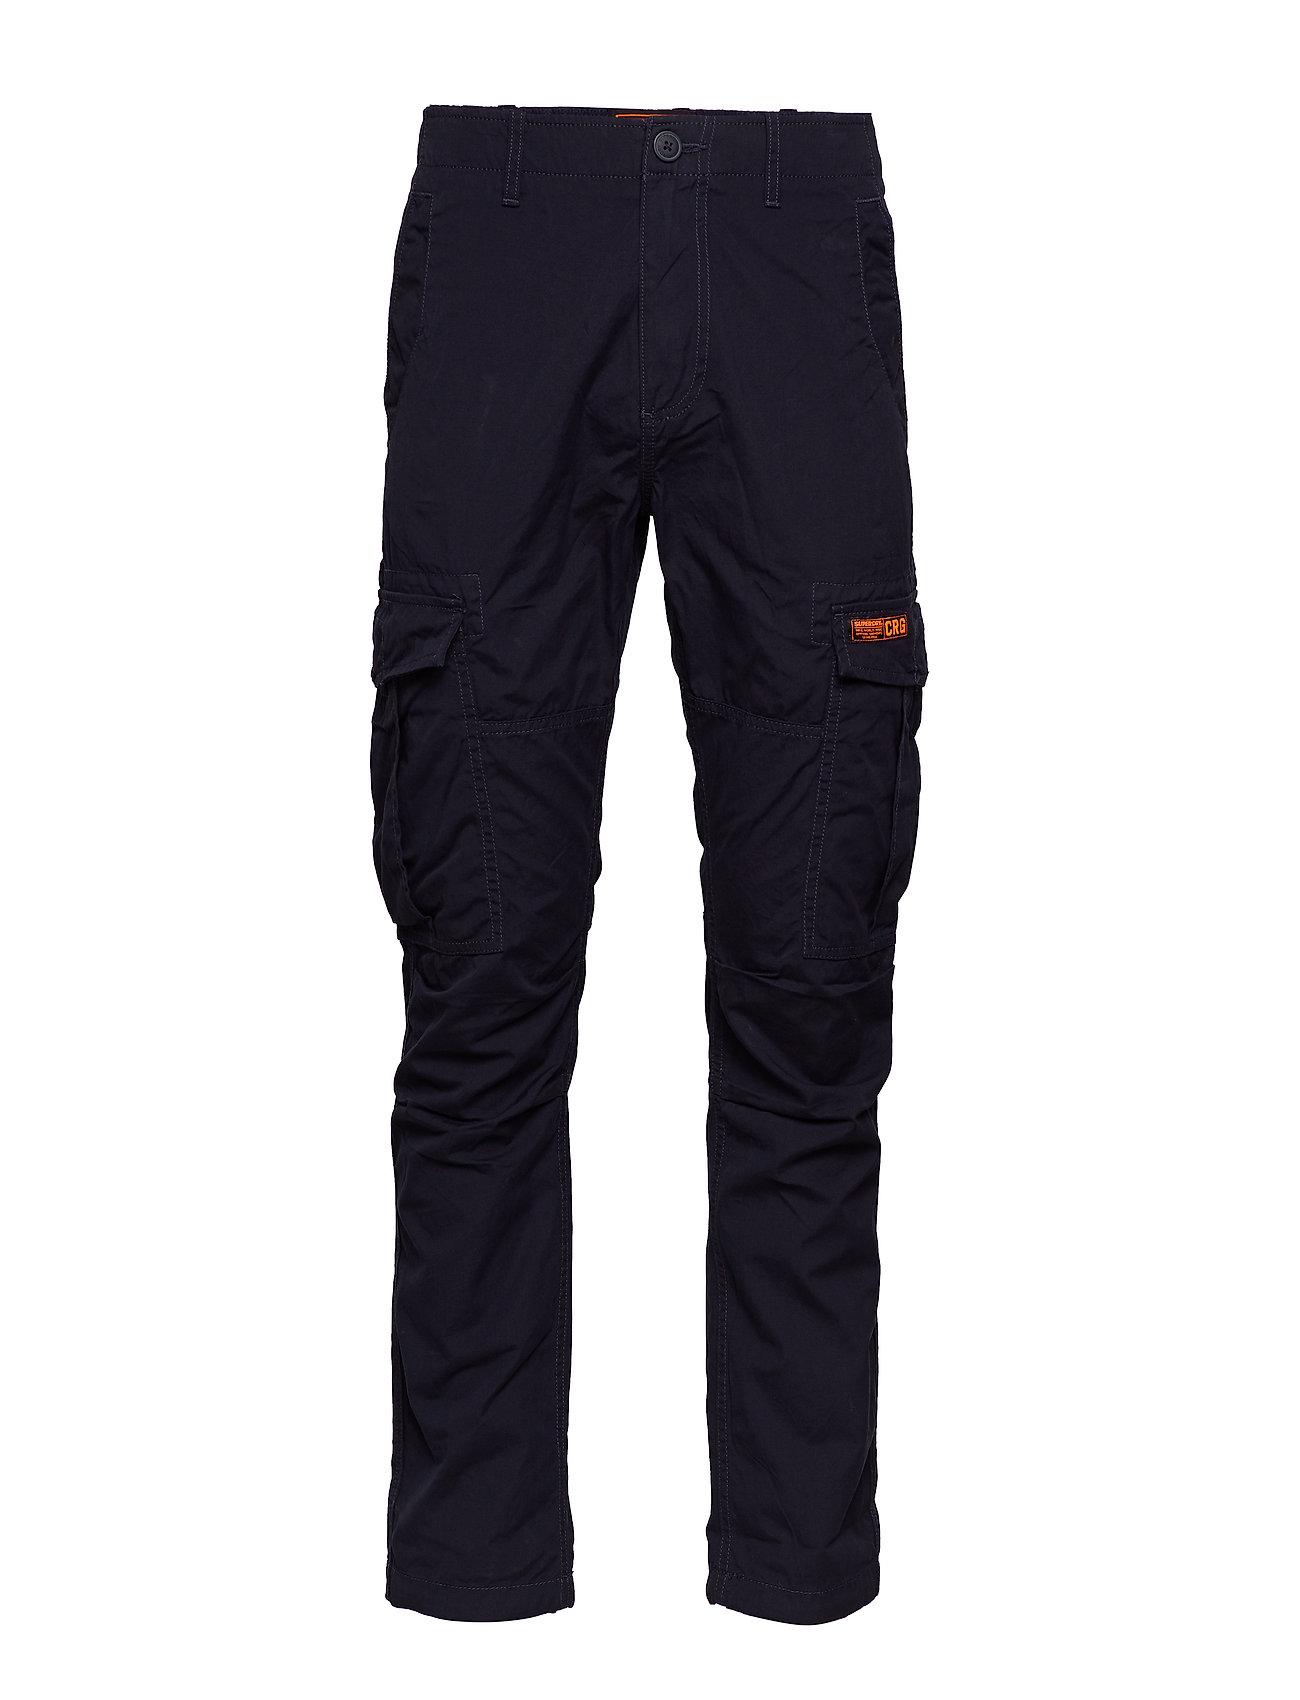 Image of Parachute Cargo Pant Trousers Cargo Pants Blå Superdry (3307692279)